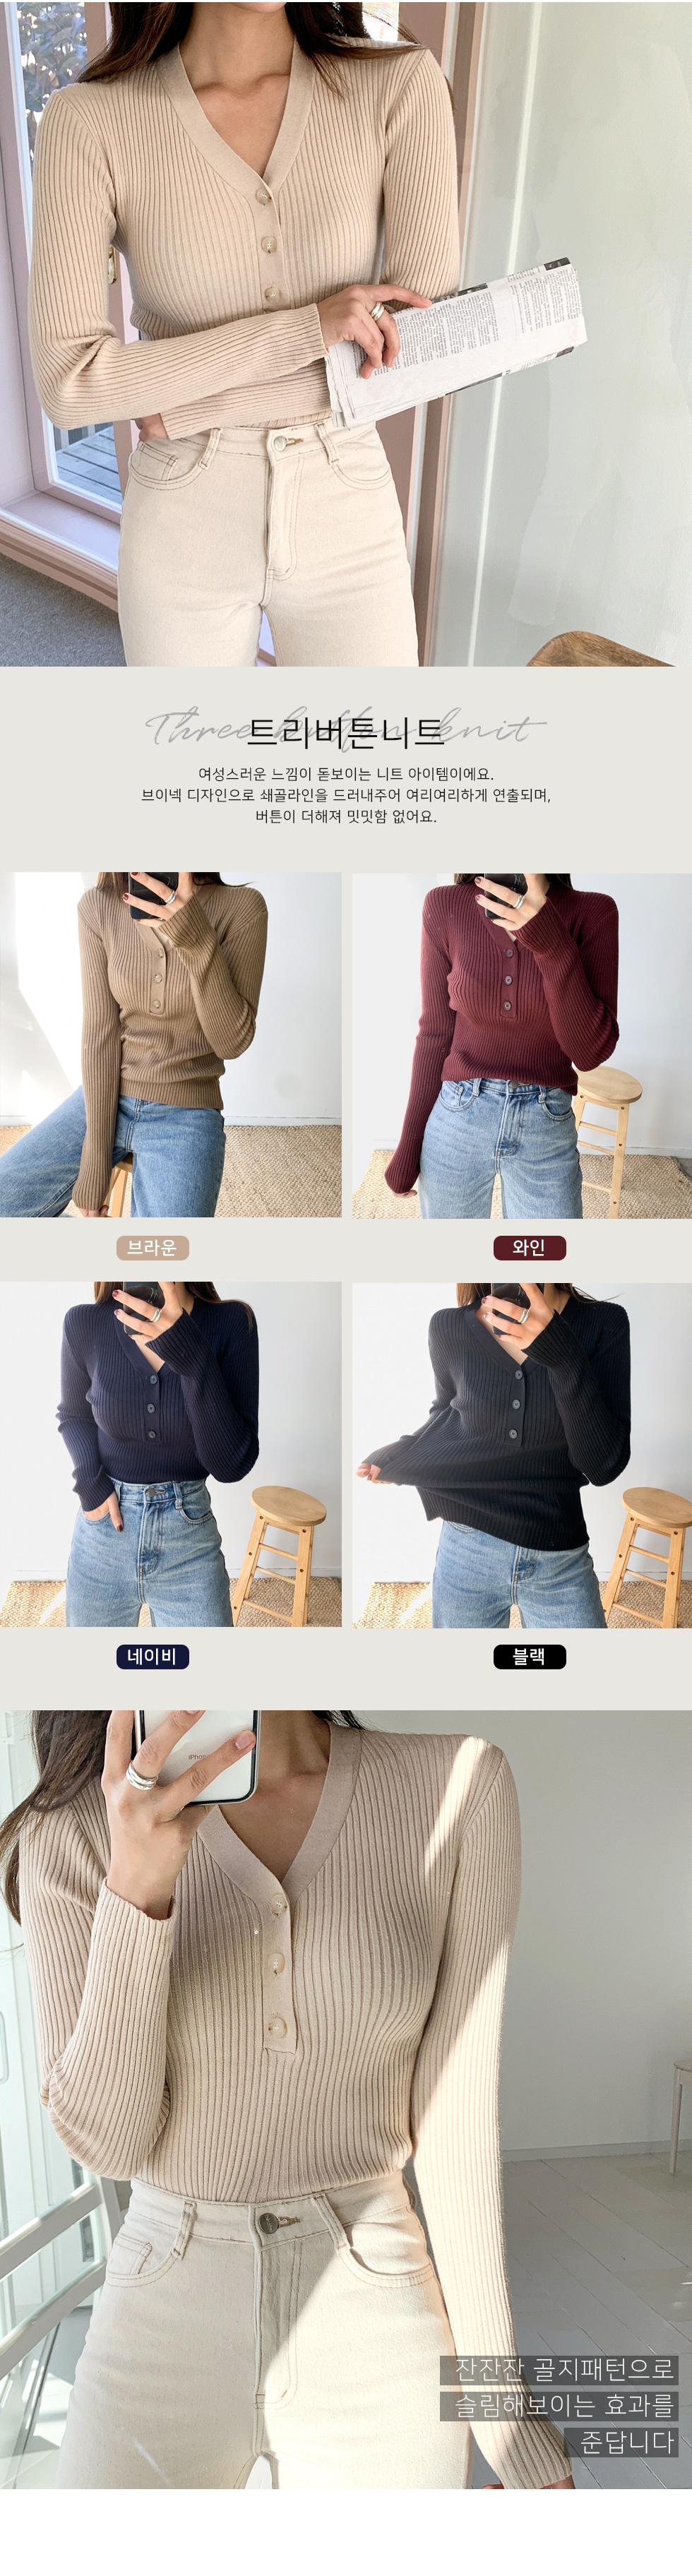 Triburton Knitwear